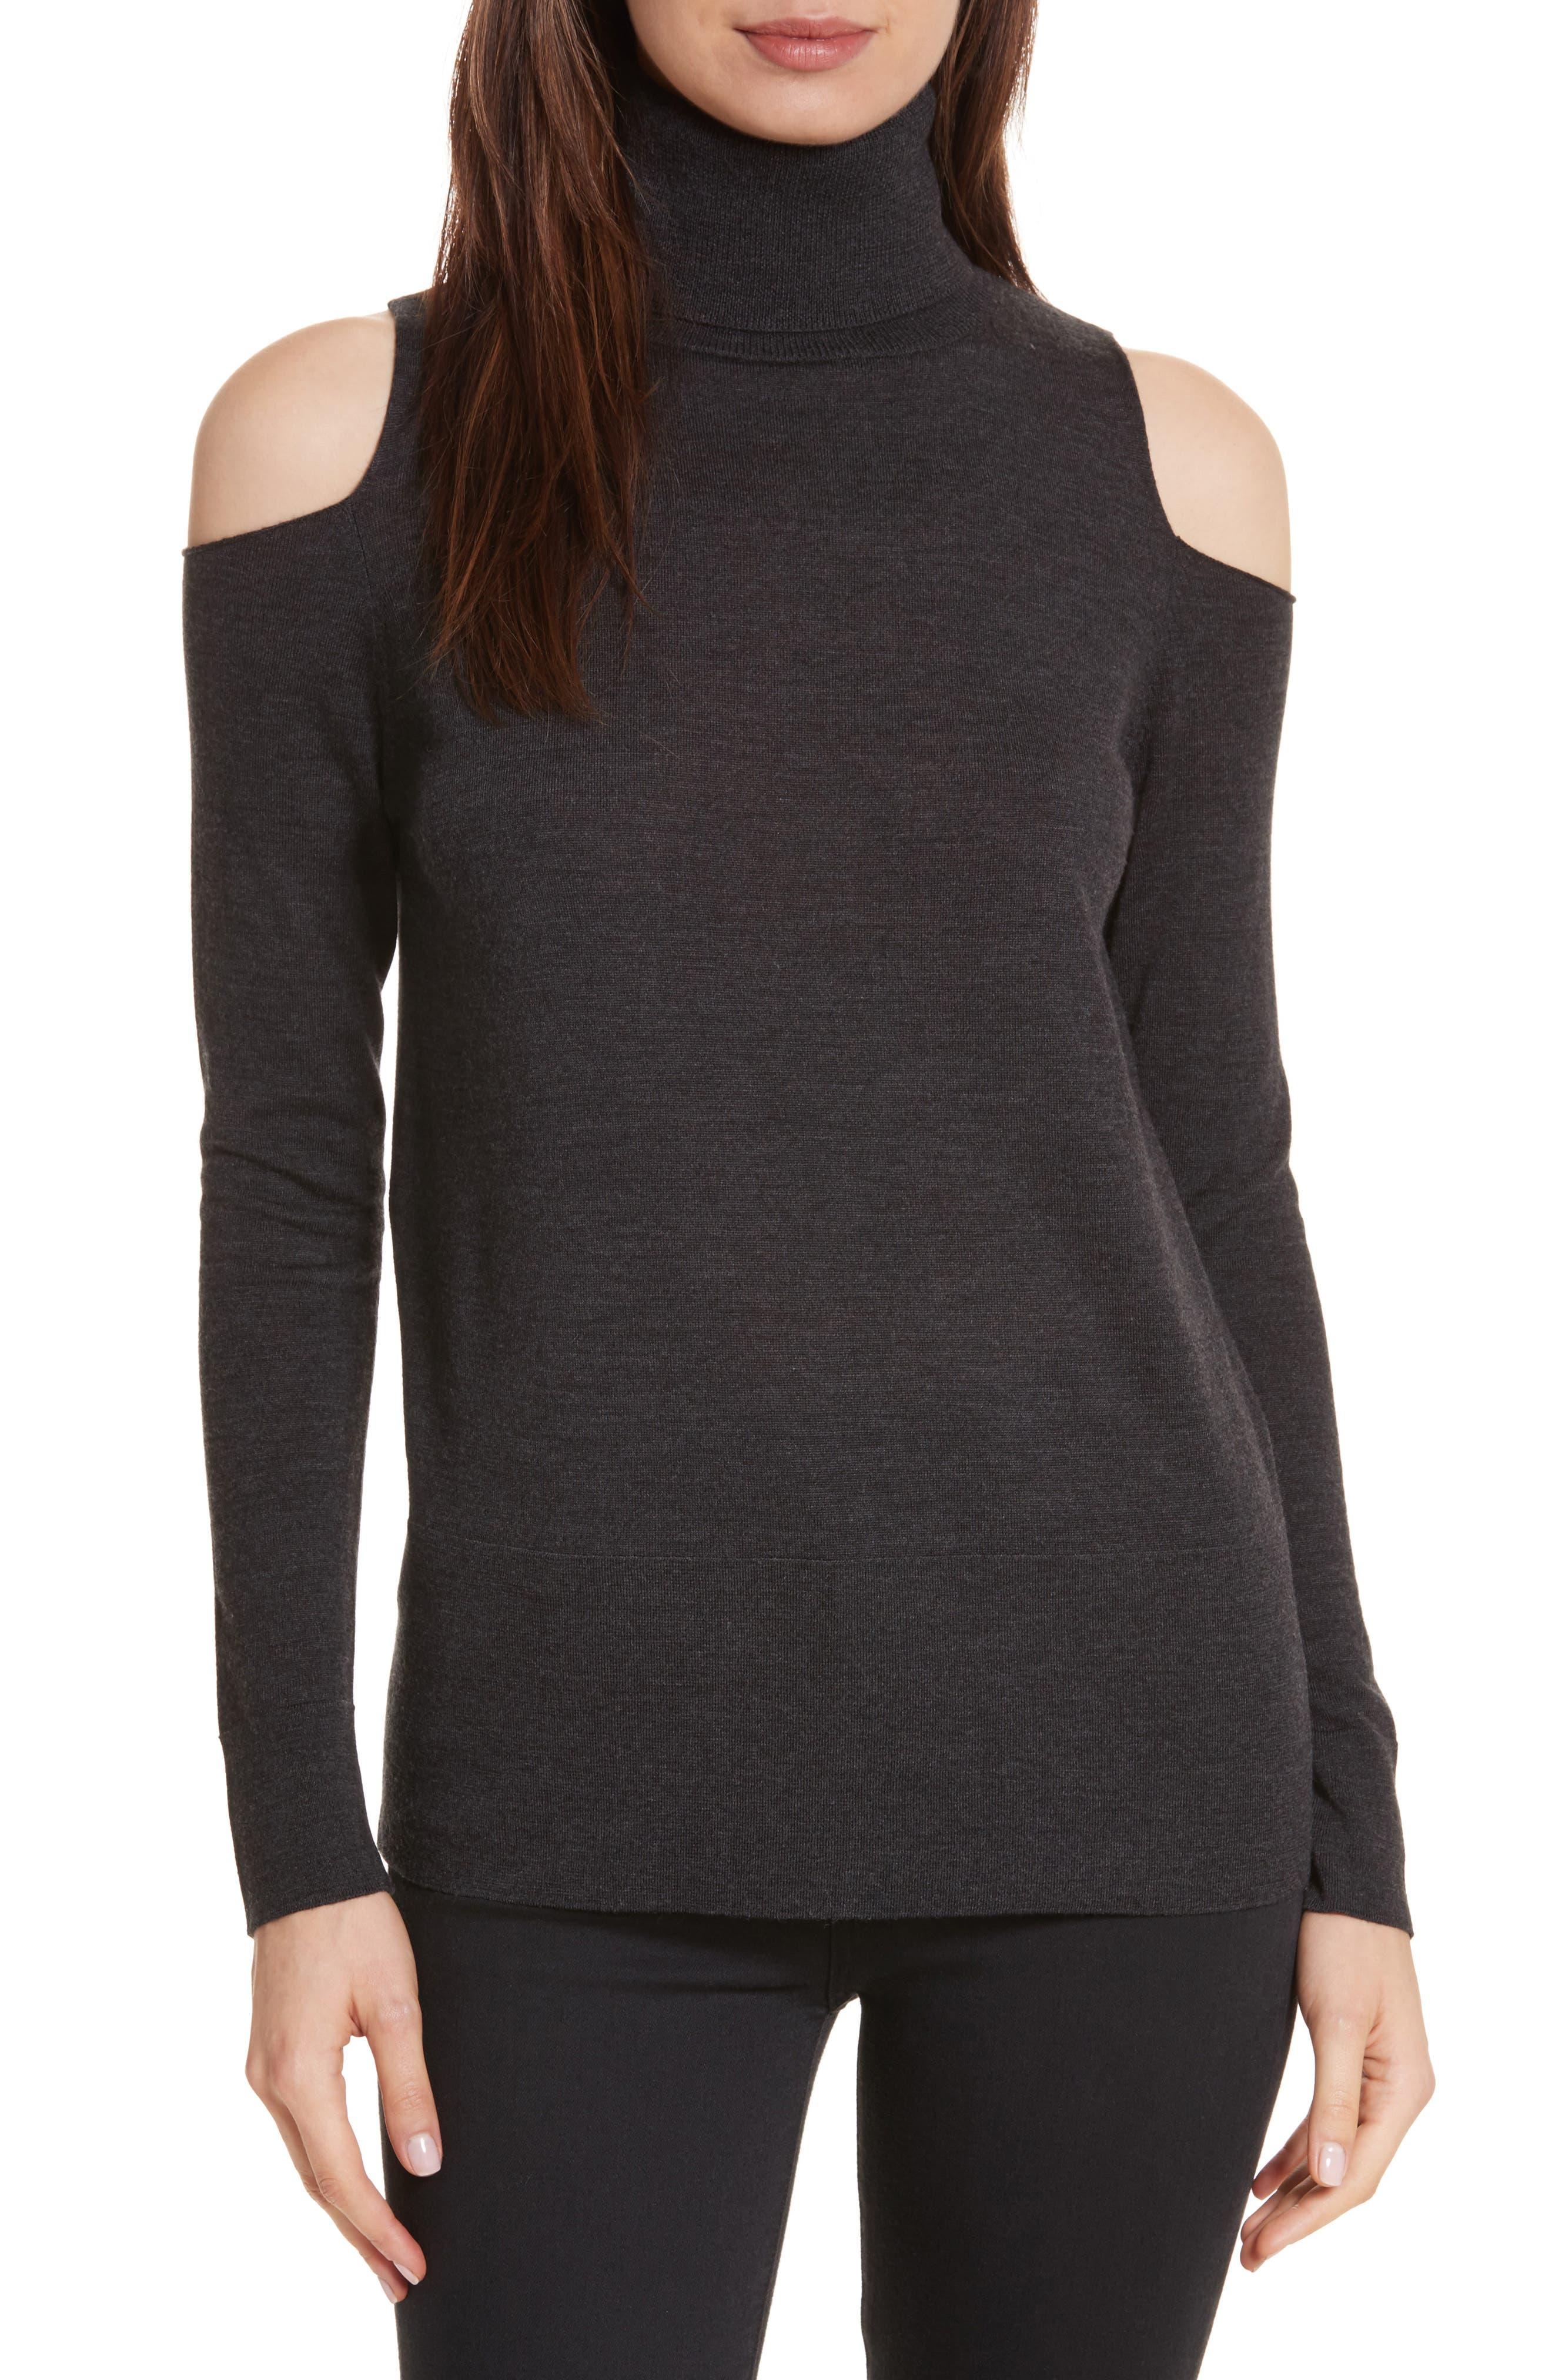 Alternate Image 1 Selected - Allude Merino Wool Cold Shoulder Turtleneck Sweater